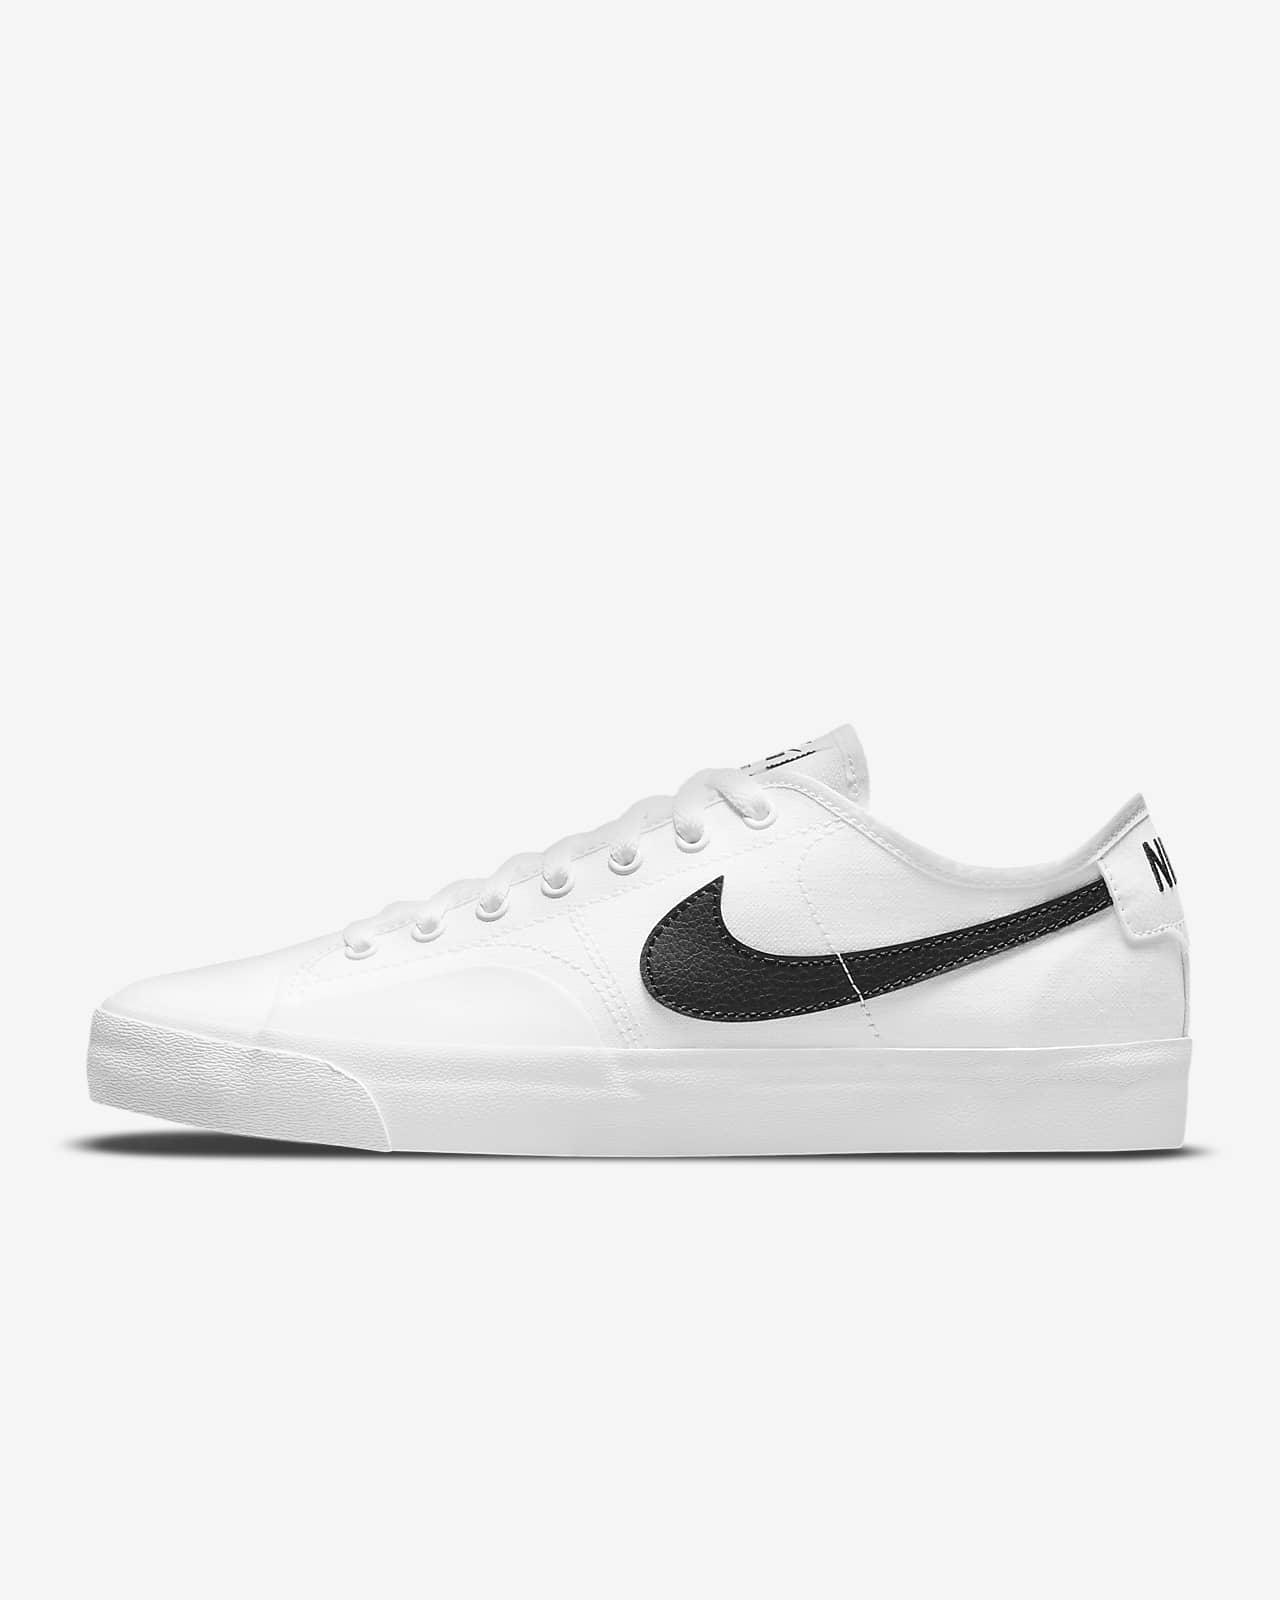 Chaussure de skateboard Nike SB BLZR Court. Nike LU